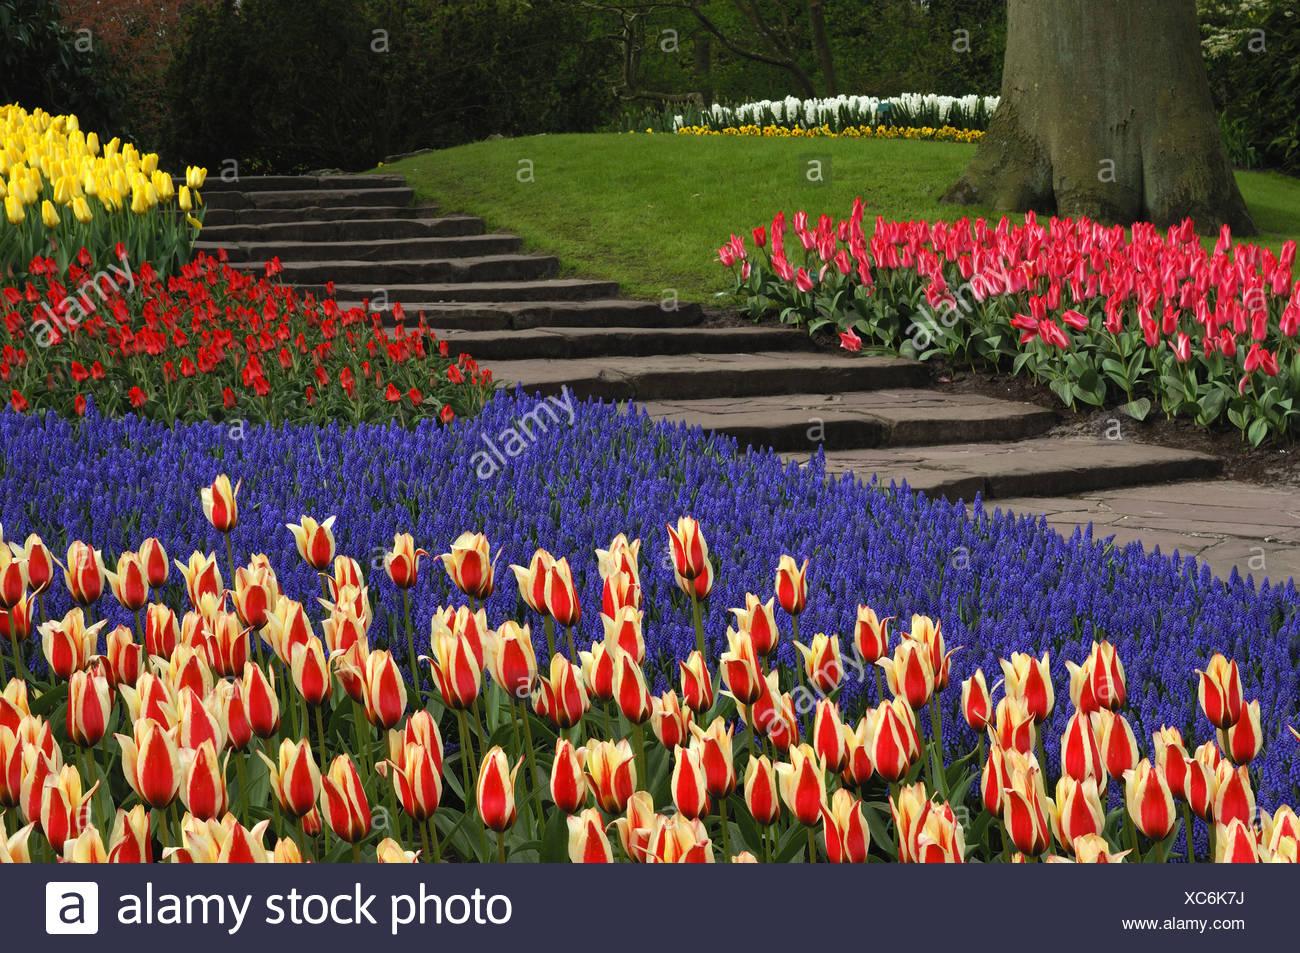 common garden tulip (Tulipa gesneriana), flowerbed with tulips and grape hyacinths, Muscari botryoides, Netherlands, Keukenhof Stock Photo